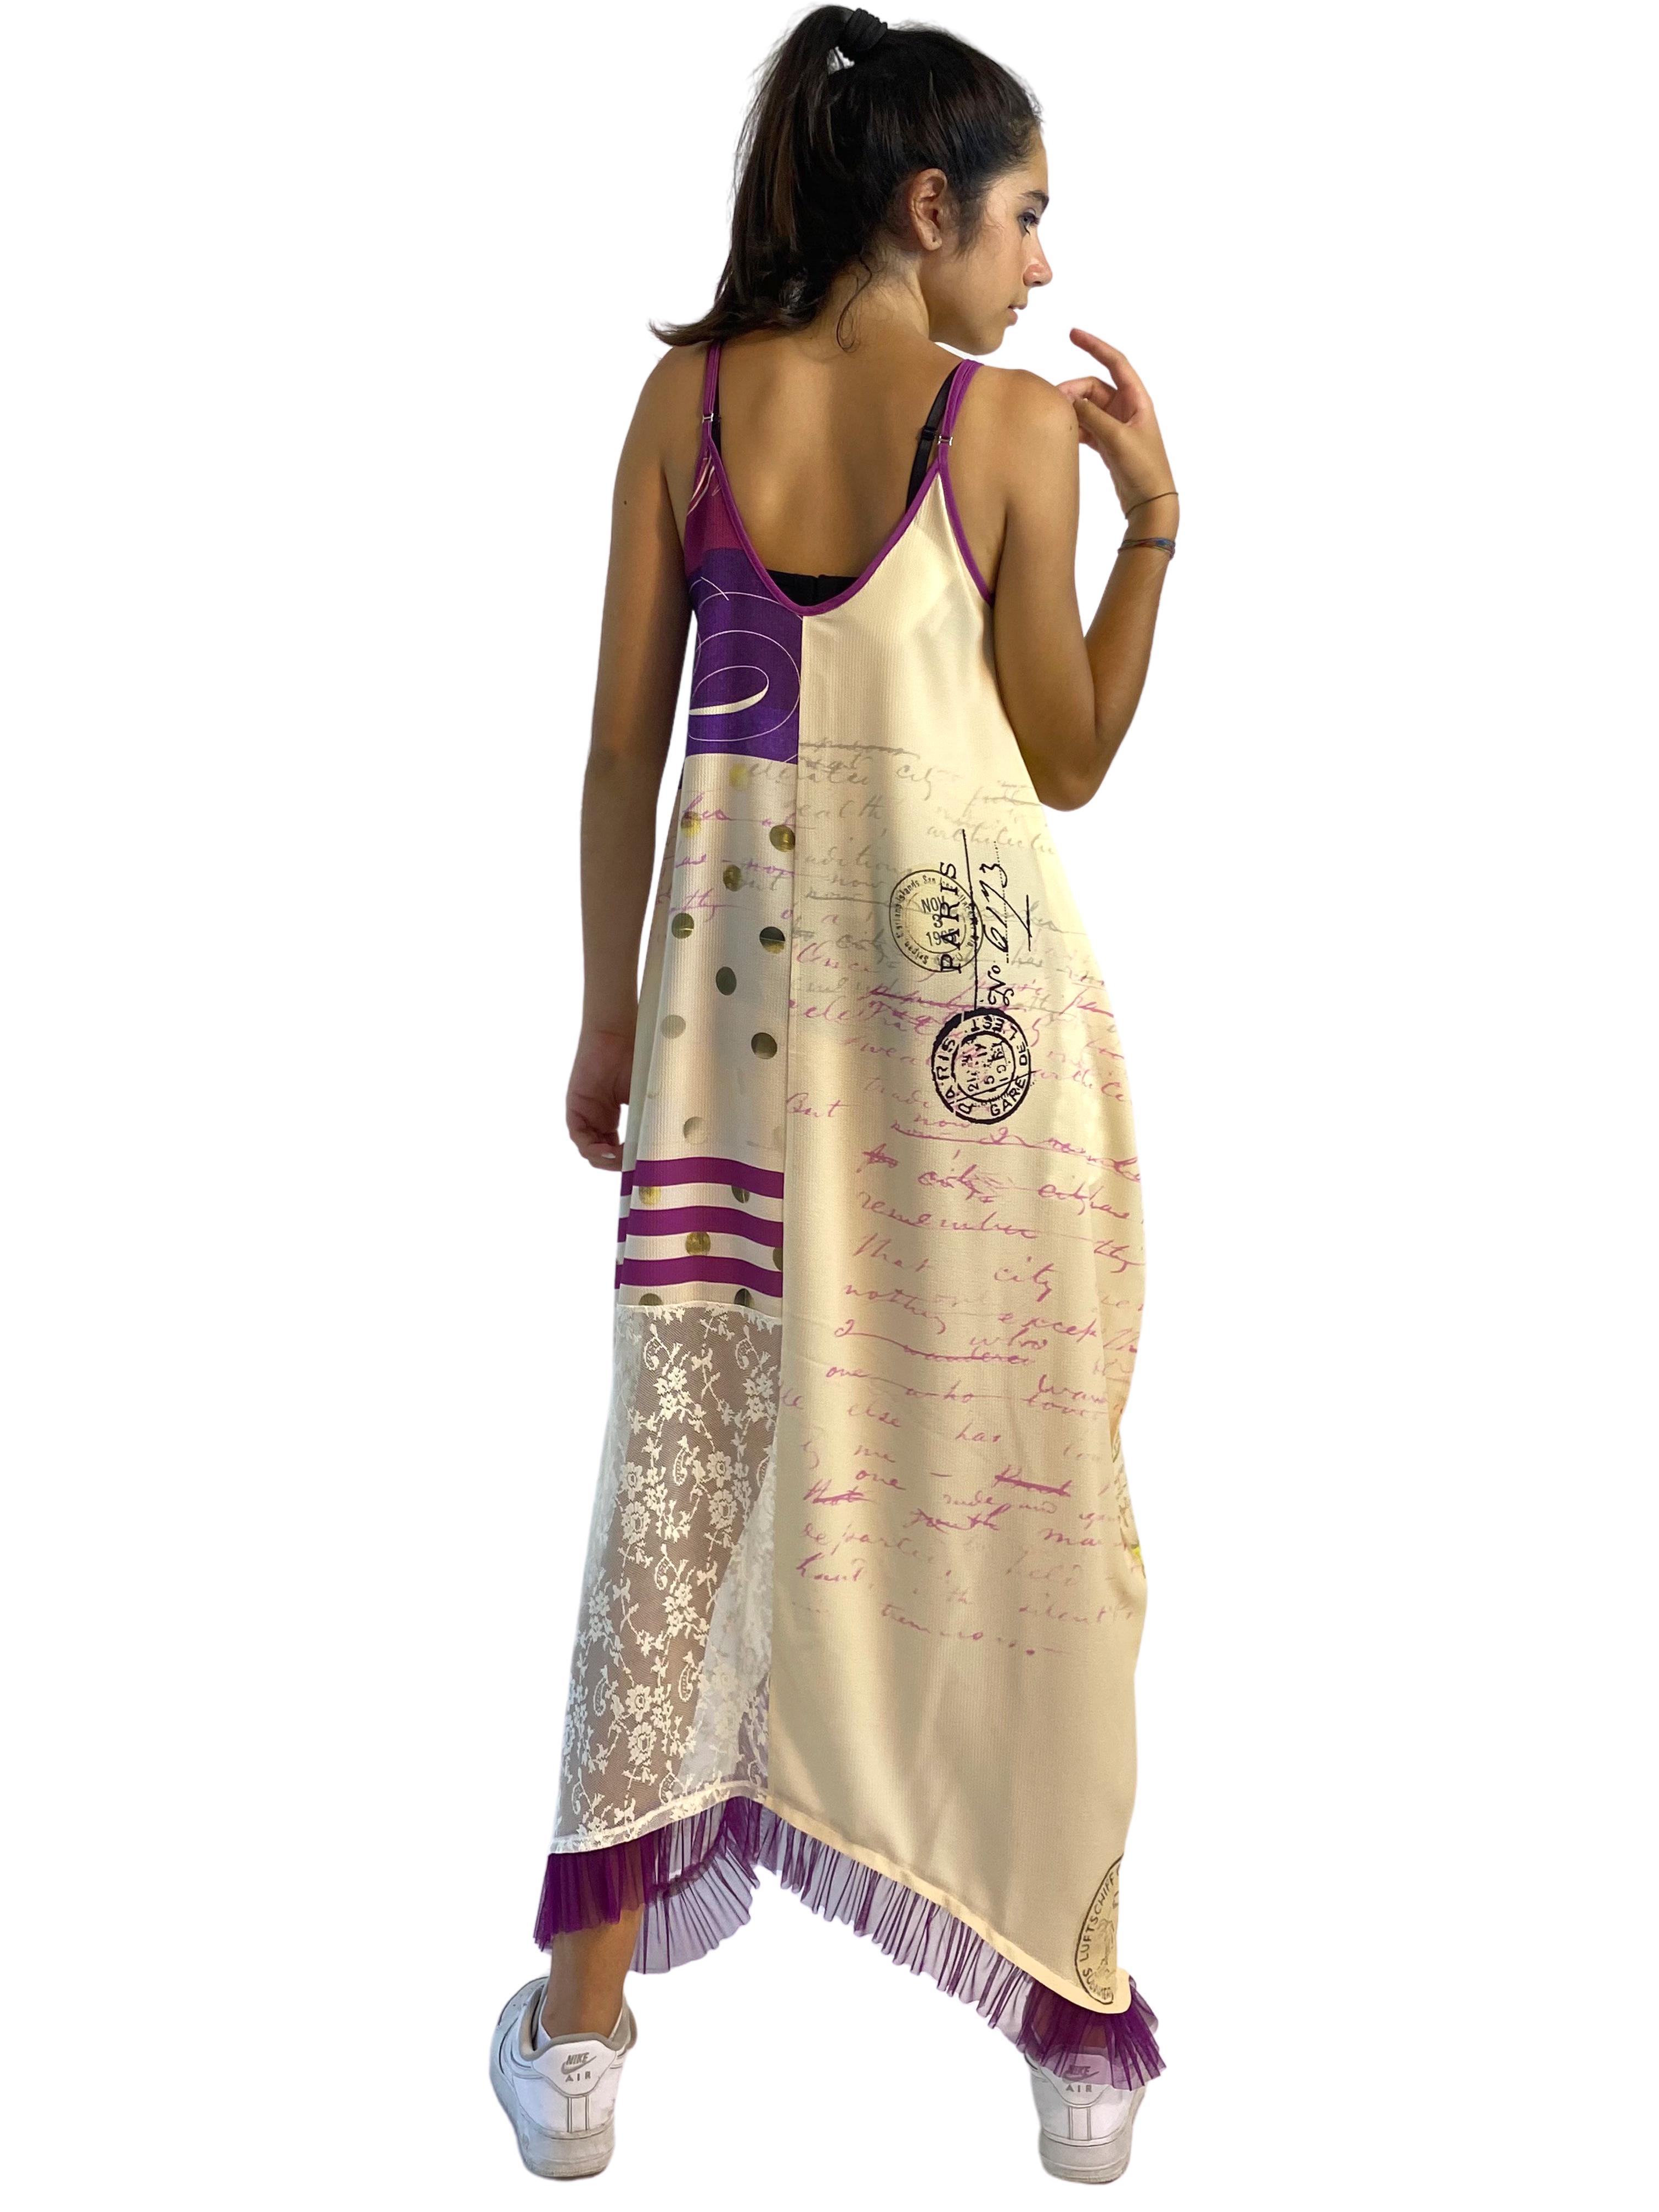 IPNG: If I Was Dancing In Paris Illusion V-Cut Maxi Dress